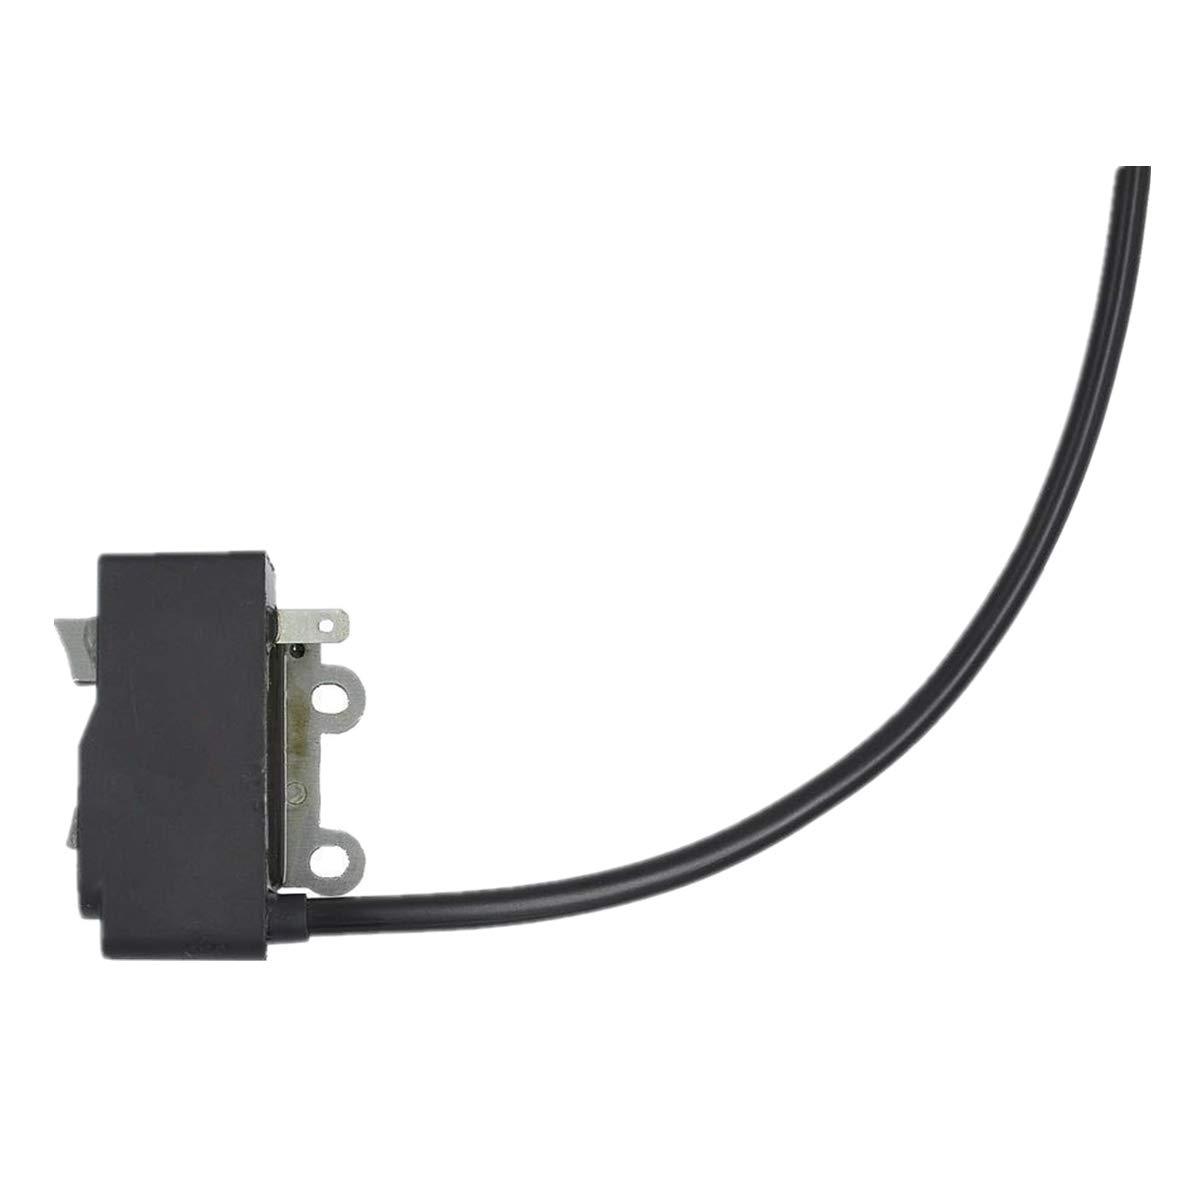 Euros A411000501 A411000500 Ignition Coil Module Fit for Echo ES-250 PB-250 PB250LN PB252